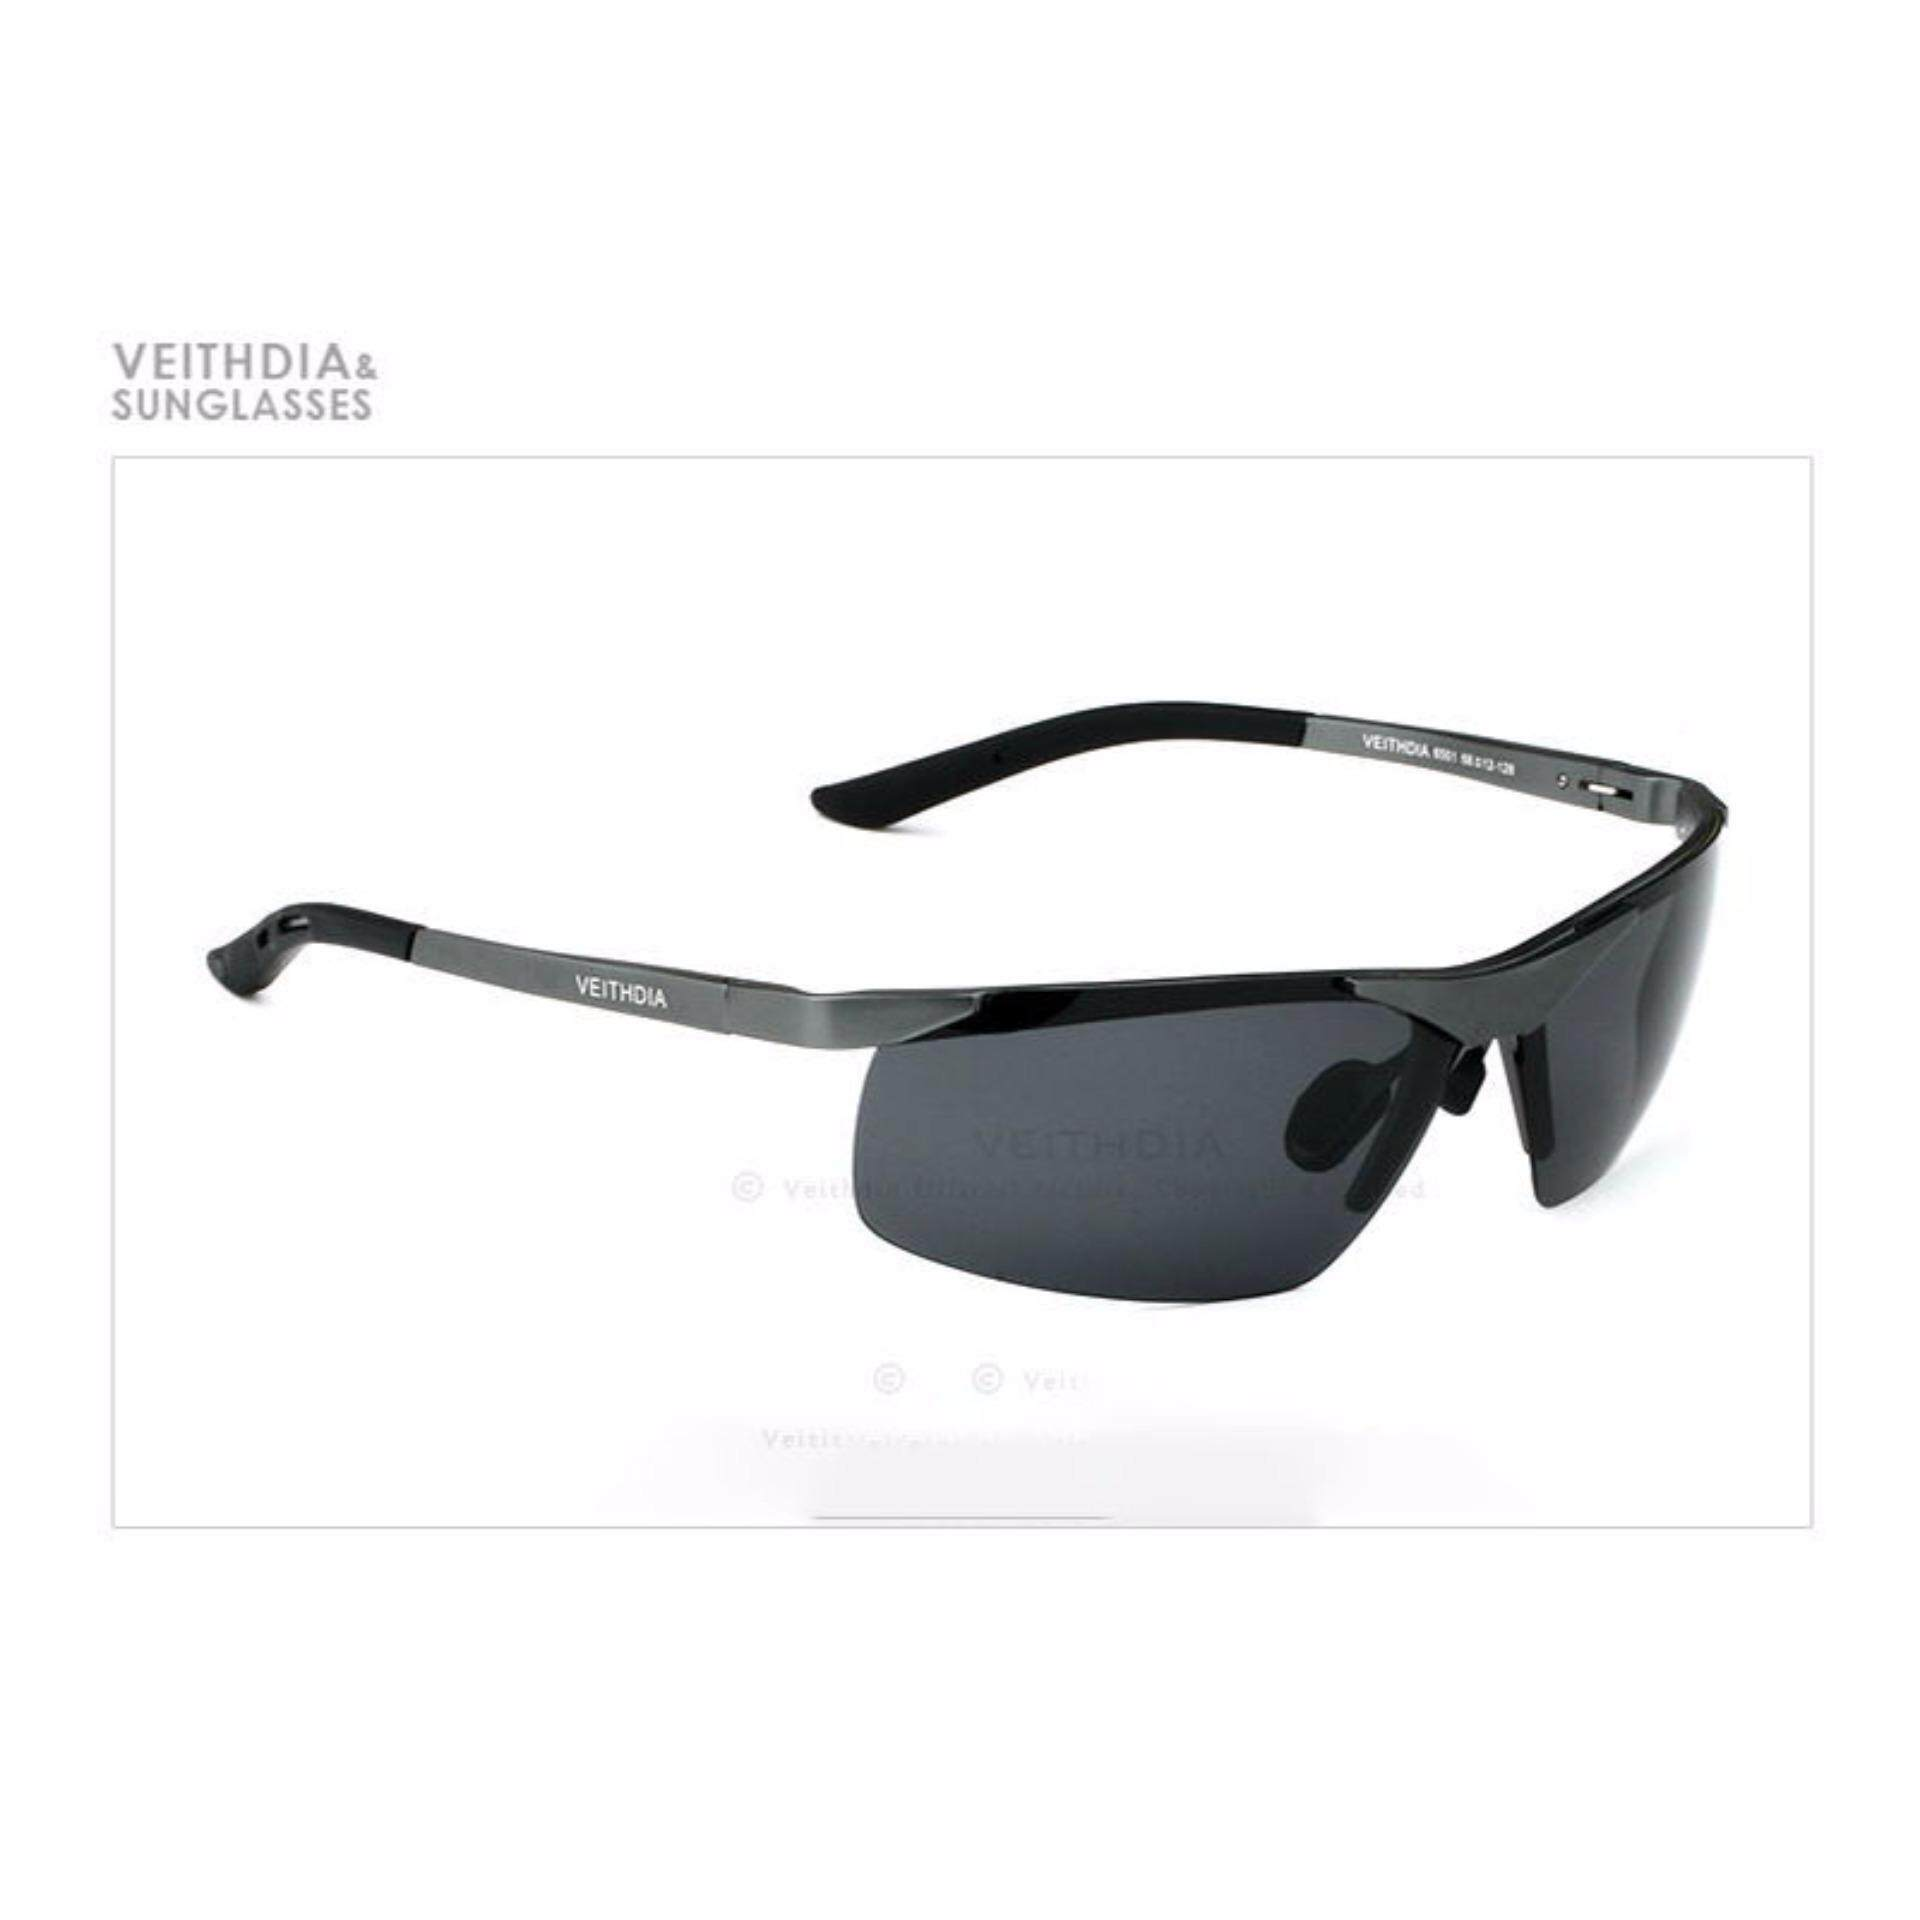 VEITHDIA Aluminium Magnesium Kacamata Hitam Terpolarisasi Laki-laki Olahraga Matahari Kacamata Malam Vision Kaca Spion